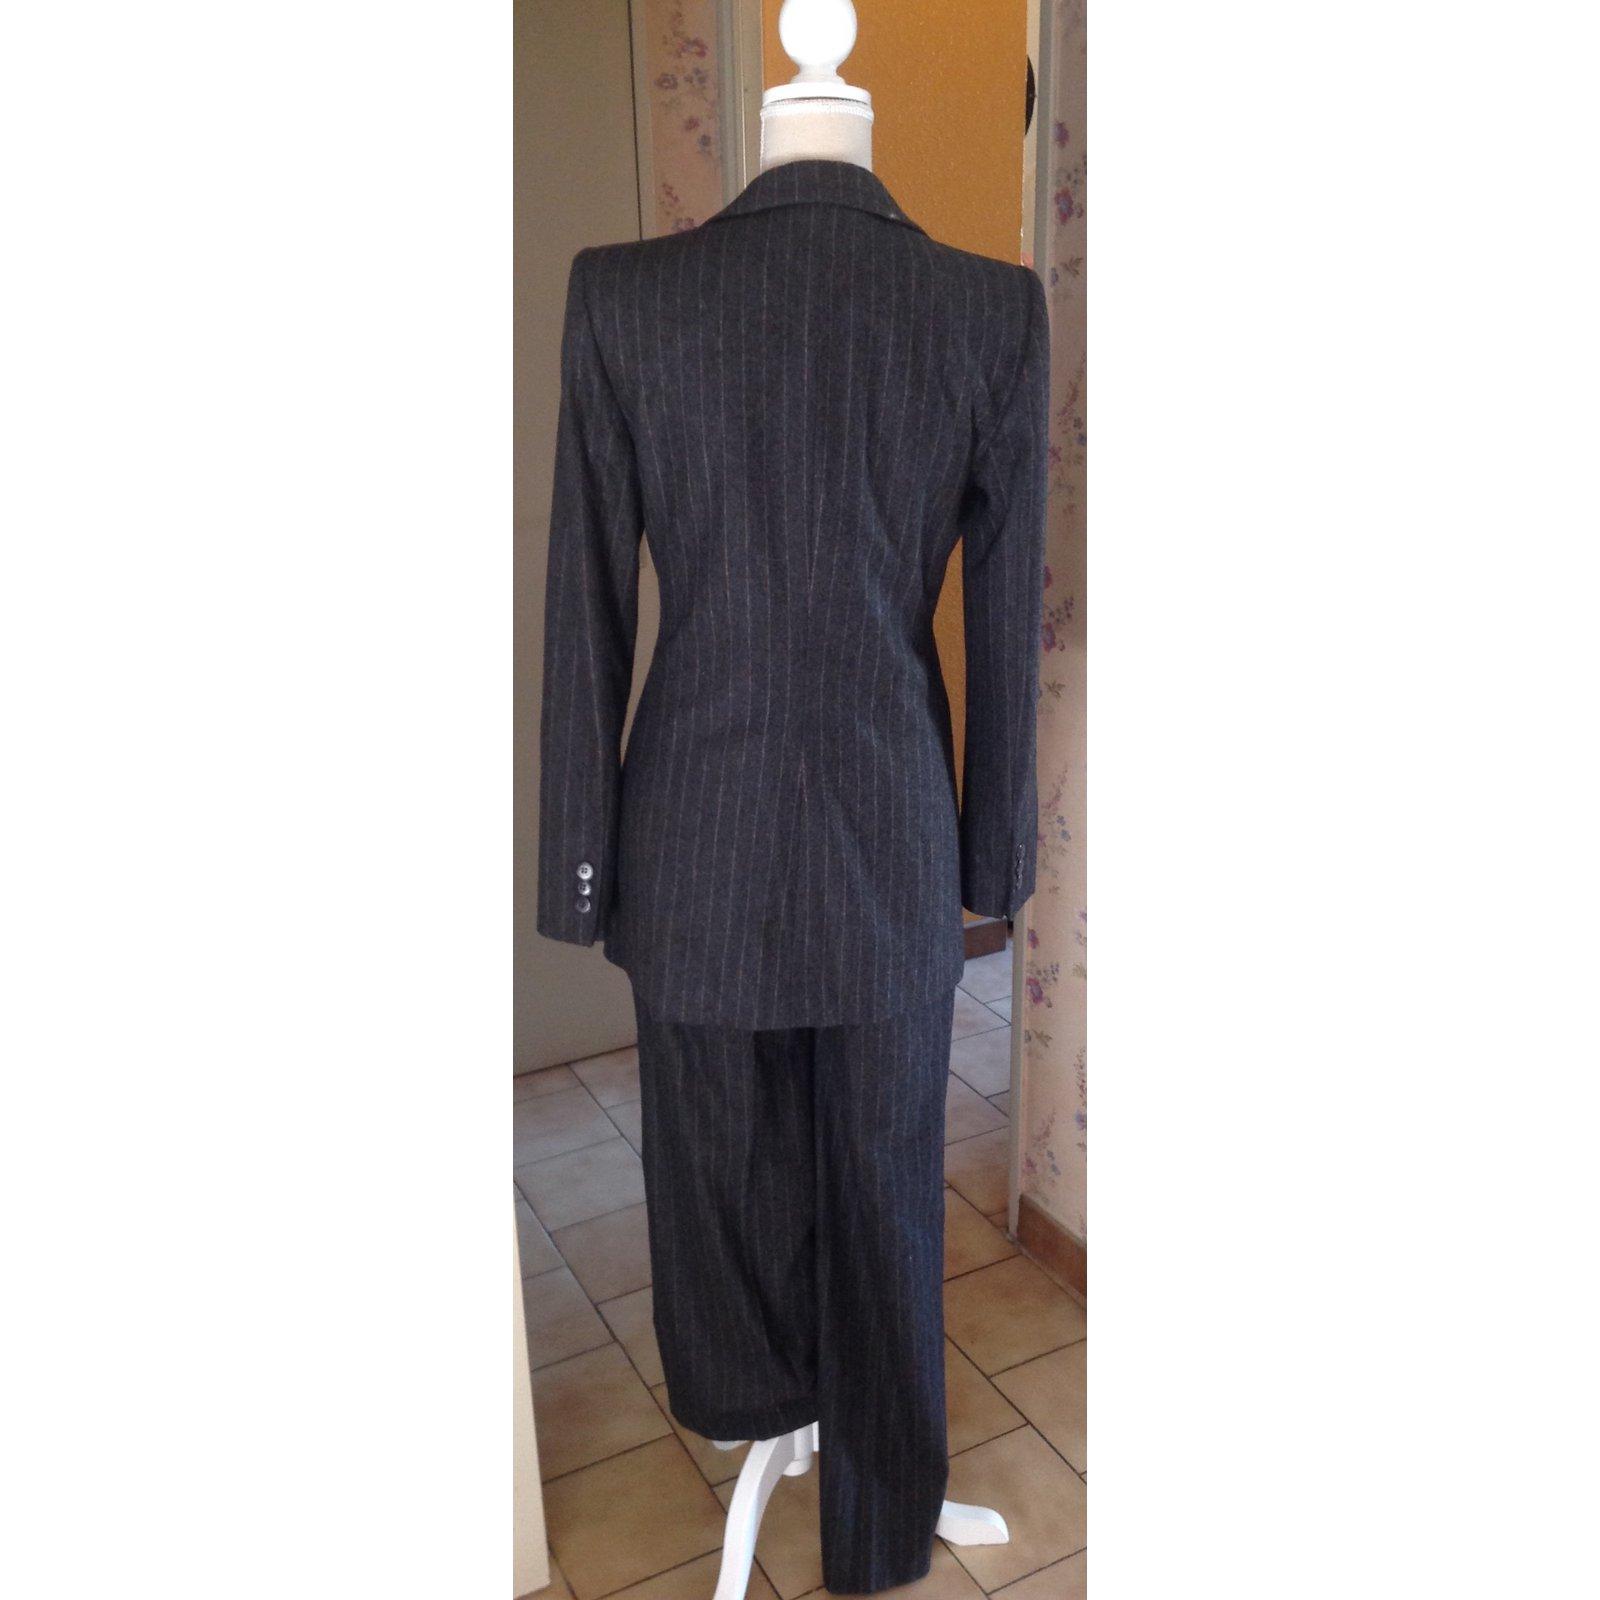 1r7q1 Cachemire Tailleur Costume Armani Borsalino Pantalon Rayè Giorgio JF1cTlK3